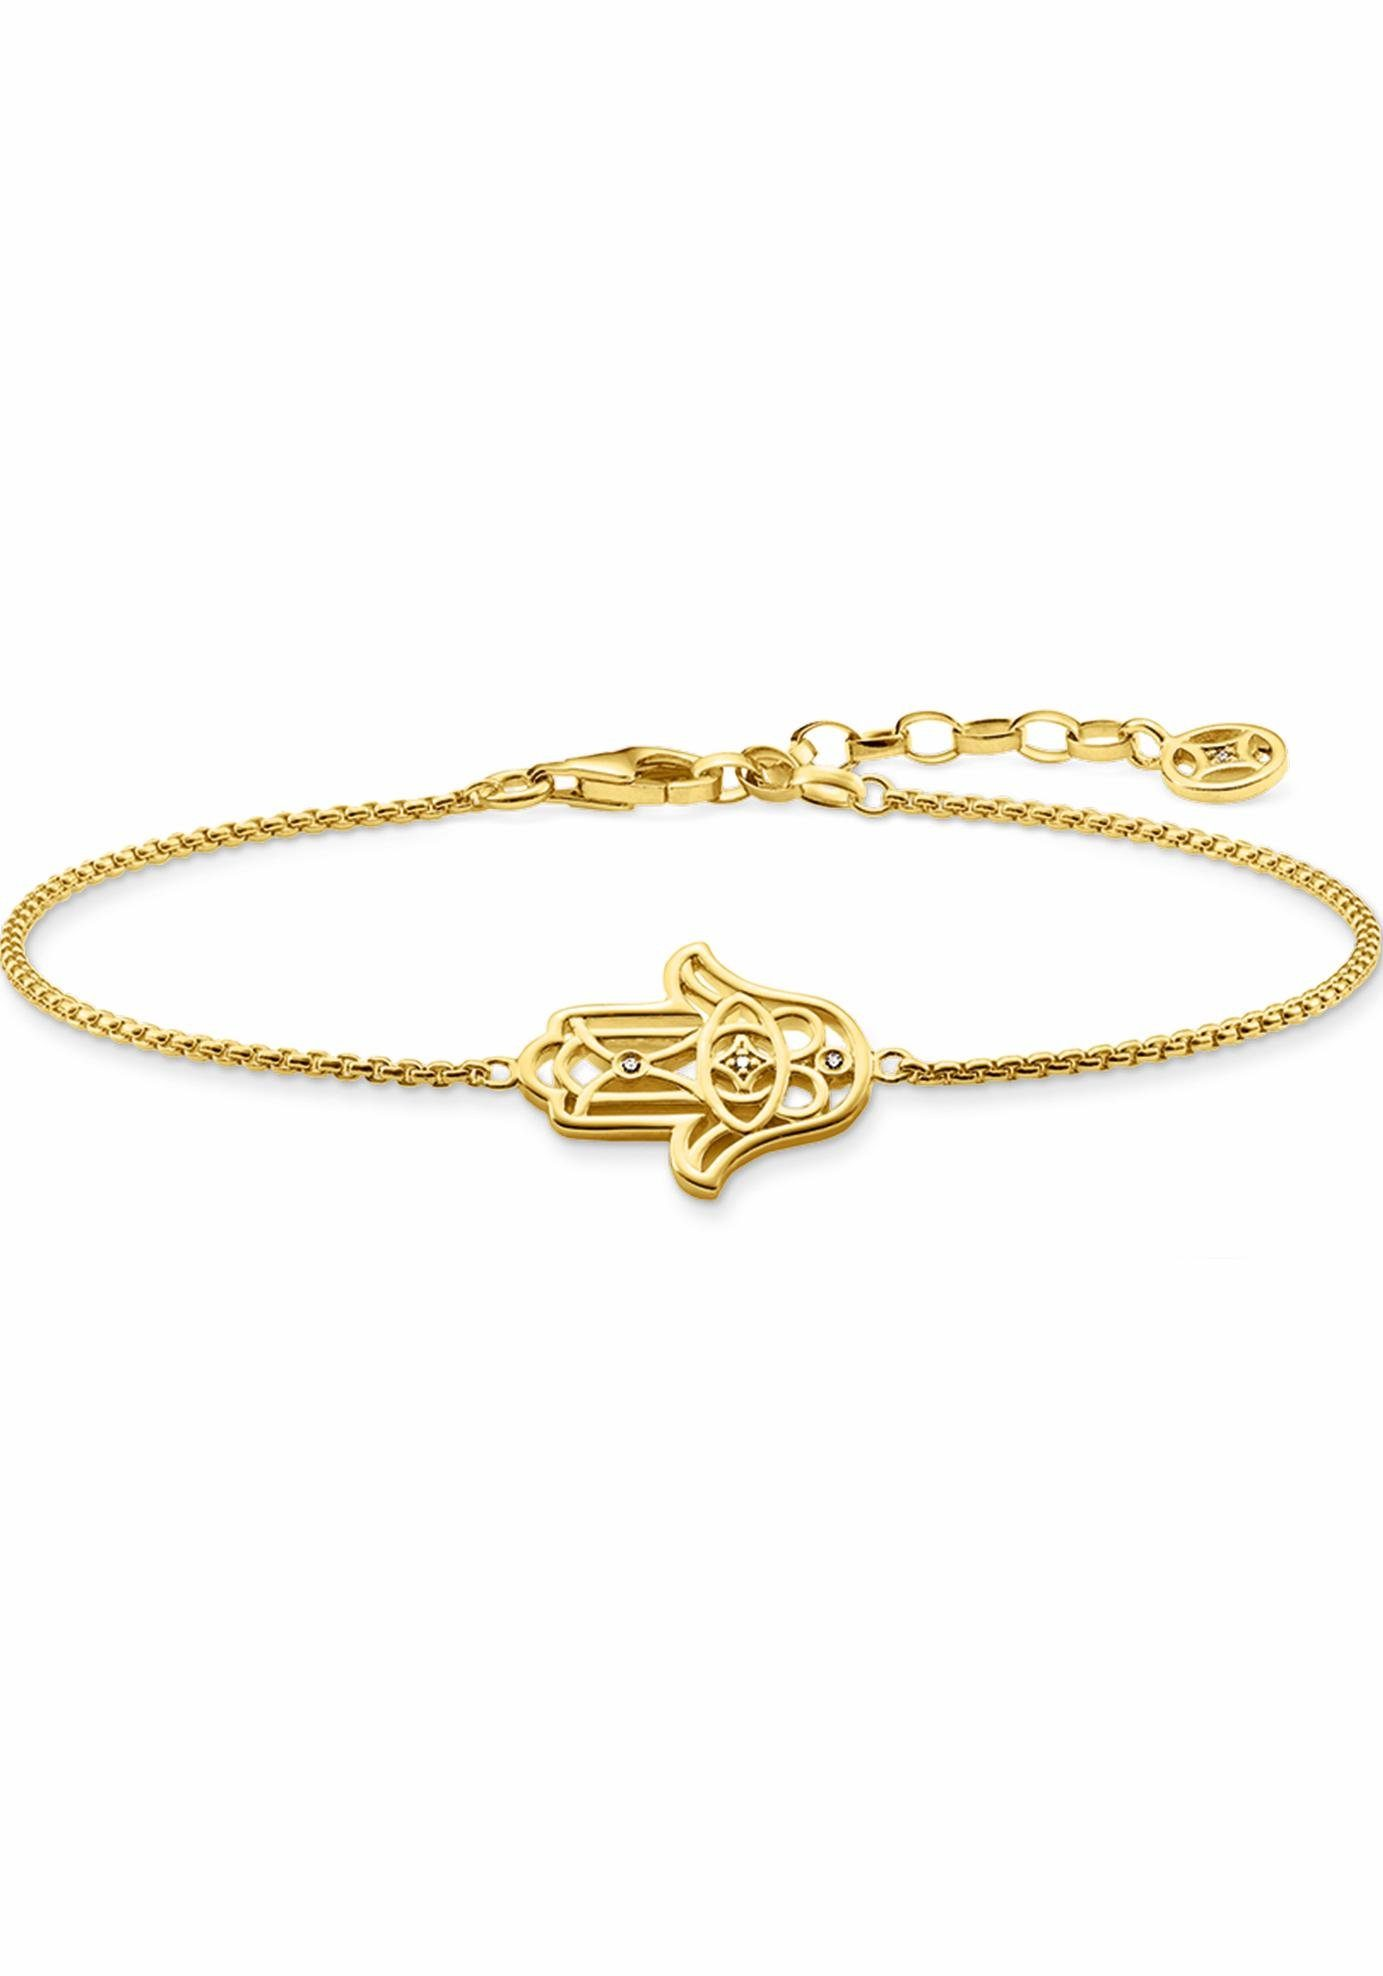 THOMAS SABO Armband »Fatimas Hand Ornamentik, D_A0020-924-39-L19v« mit Diamanten